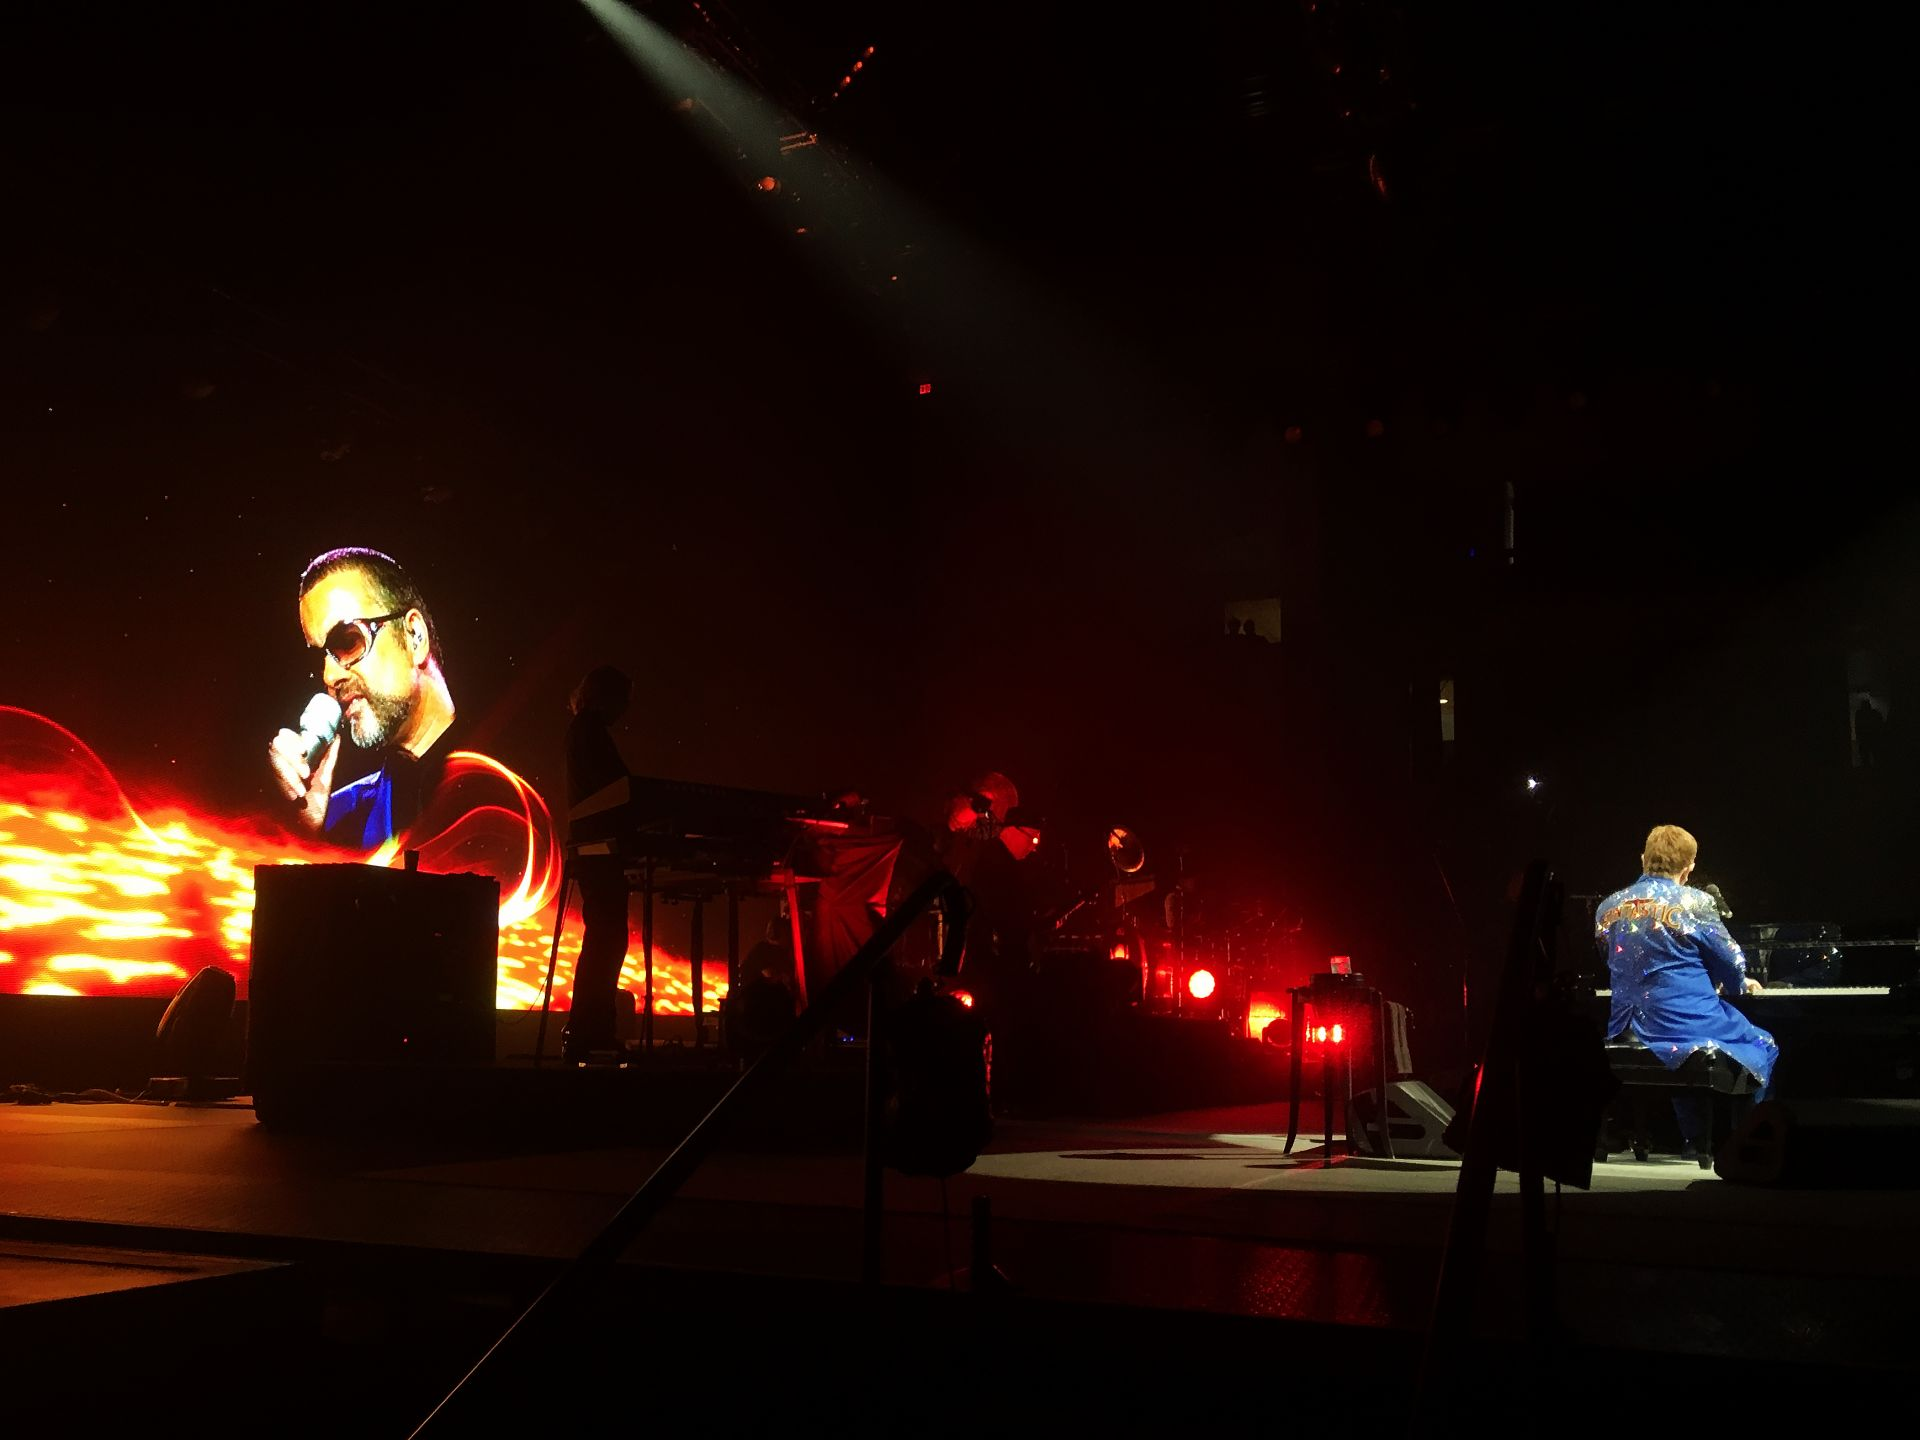 Elton performs 'Don't Let The Sun Go Down On Me' in Bangor, Maine: November 18, 2017. (Photo: John F. Higgins)